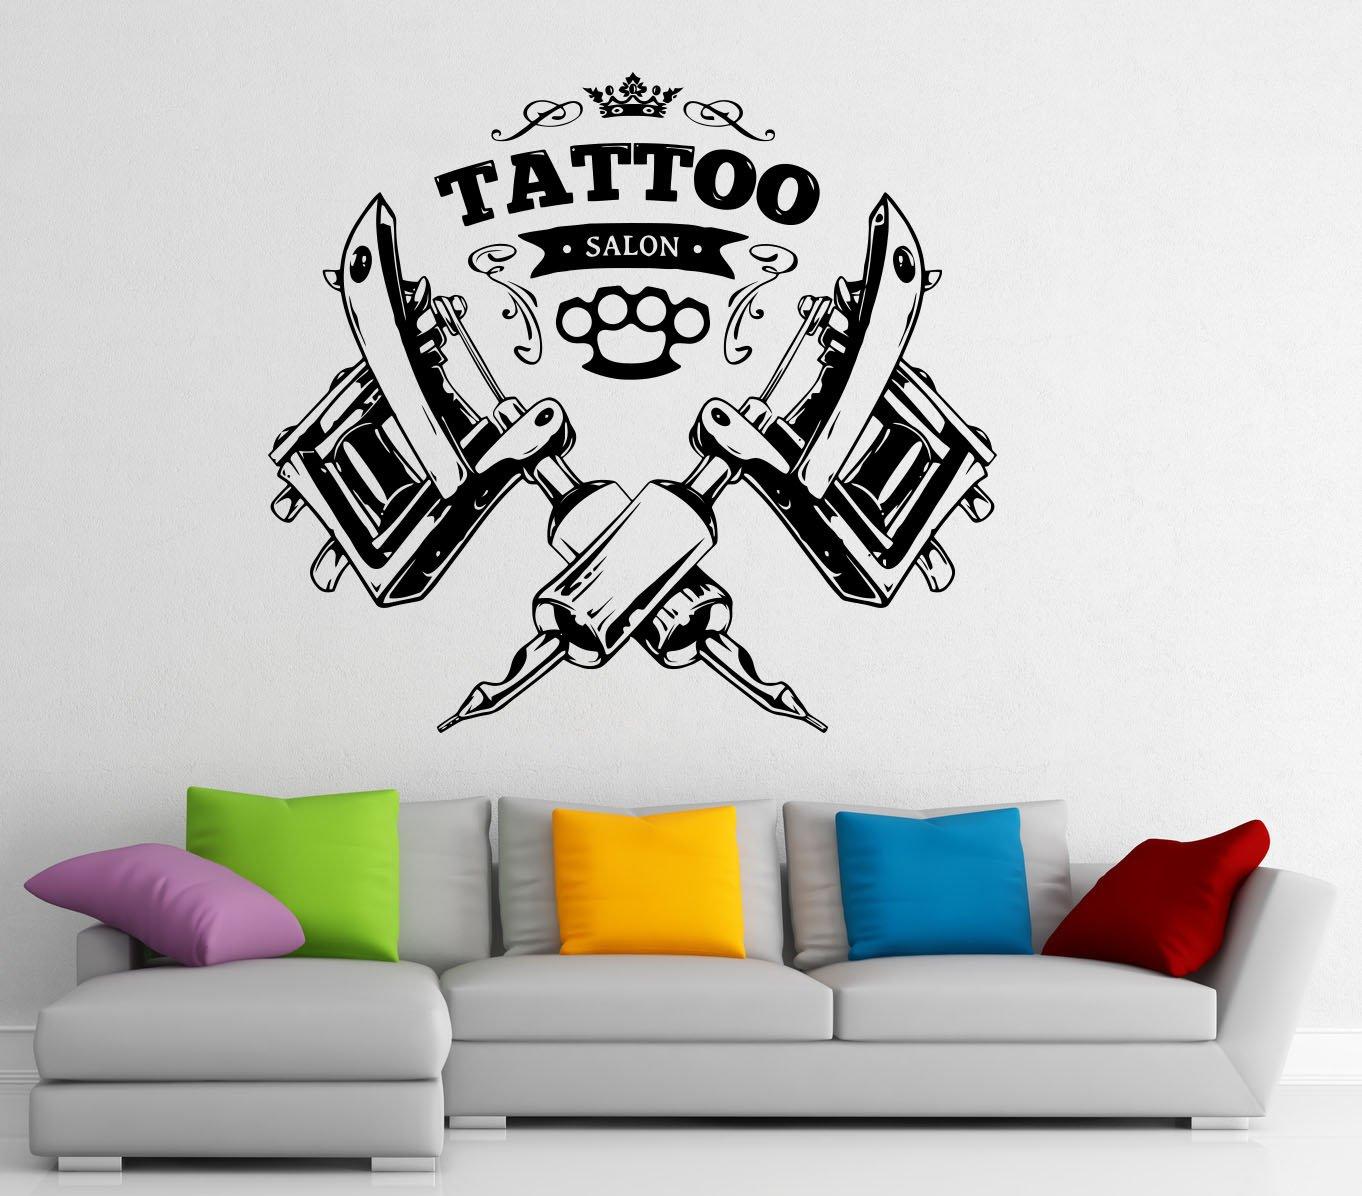 tattoo shop logo wall decal vinyl sticker tattoo salon window tattoo shop logo wall decal vinyl sticker tattoo salon window sticker wall decor 1t01s amazon com